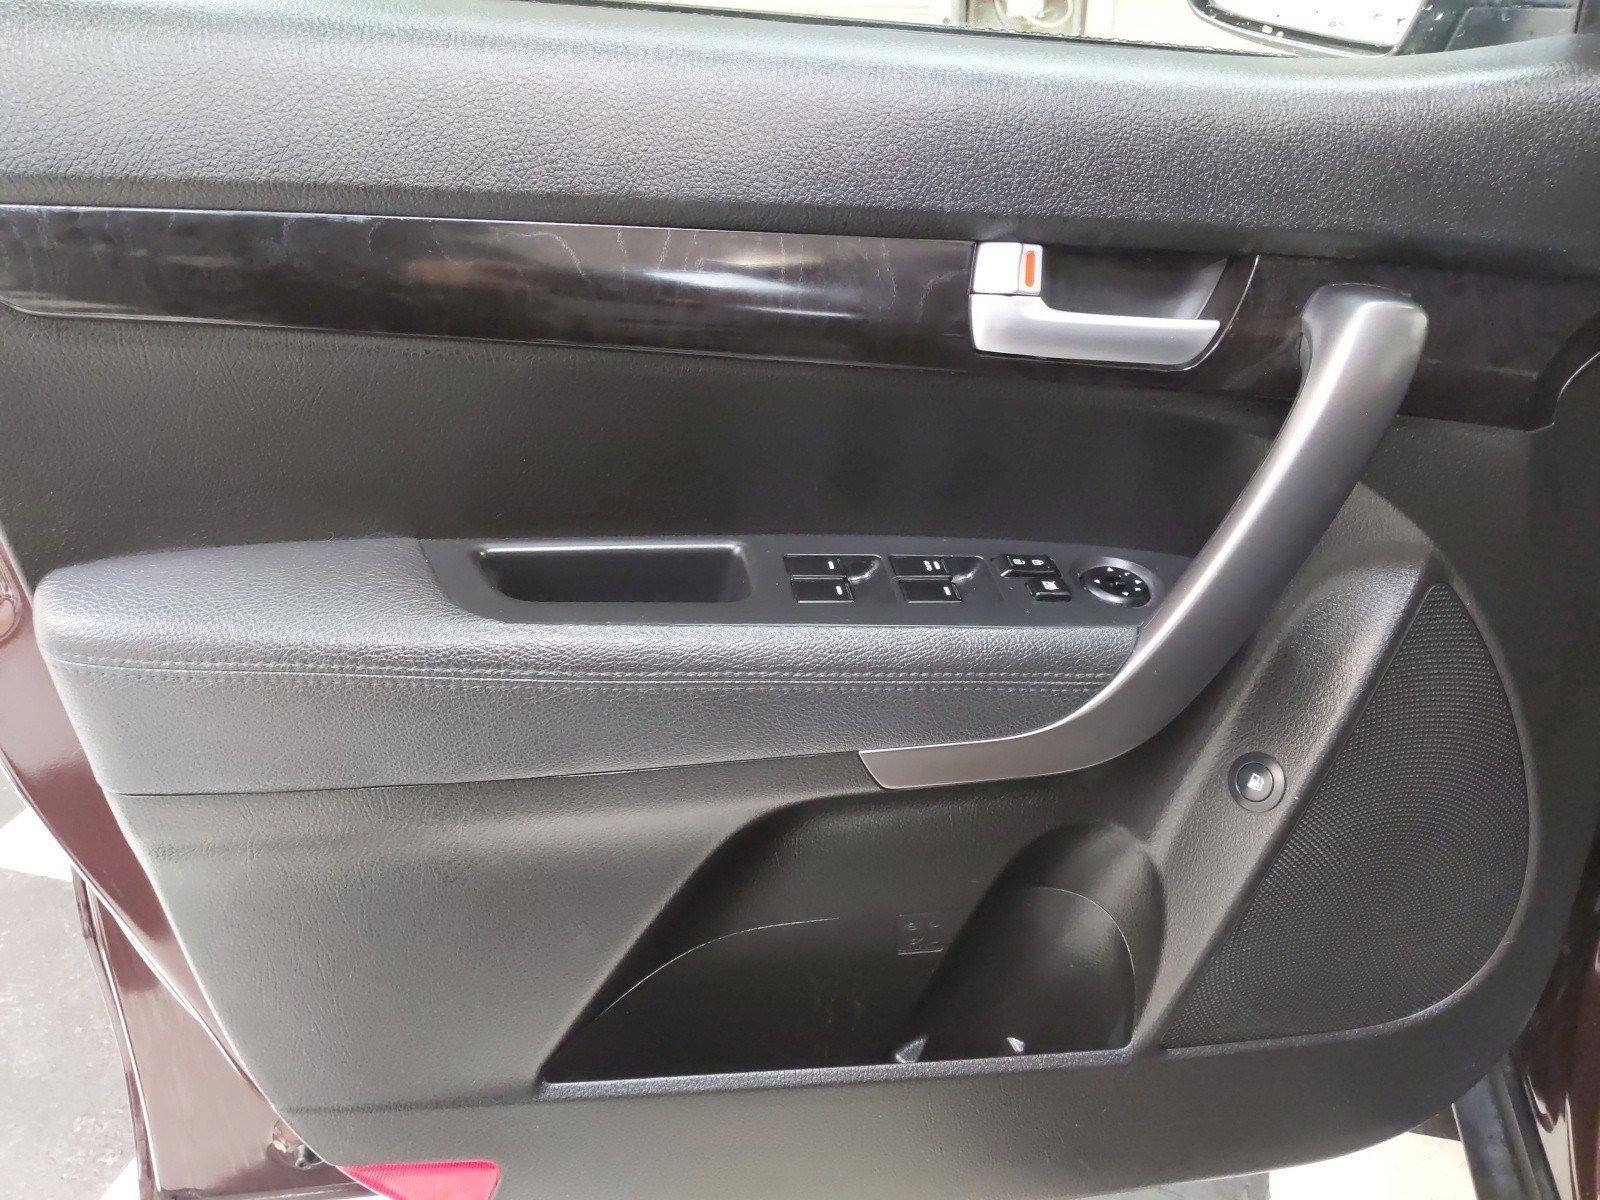 Used 2014 Kia Sorento LX 4D Sport Utility for sale in Grand Island NE